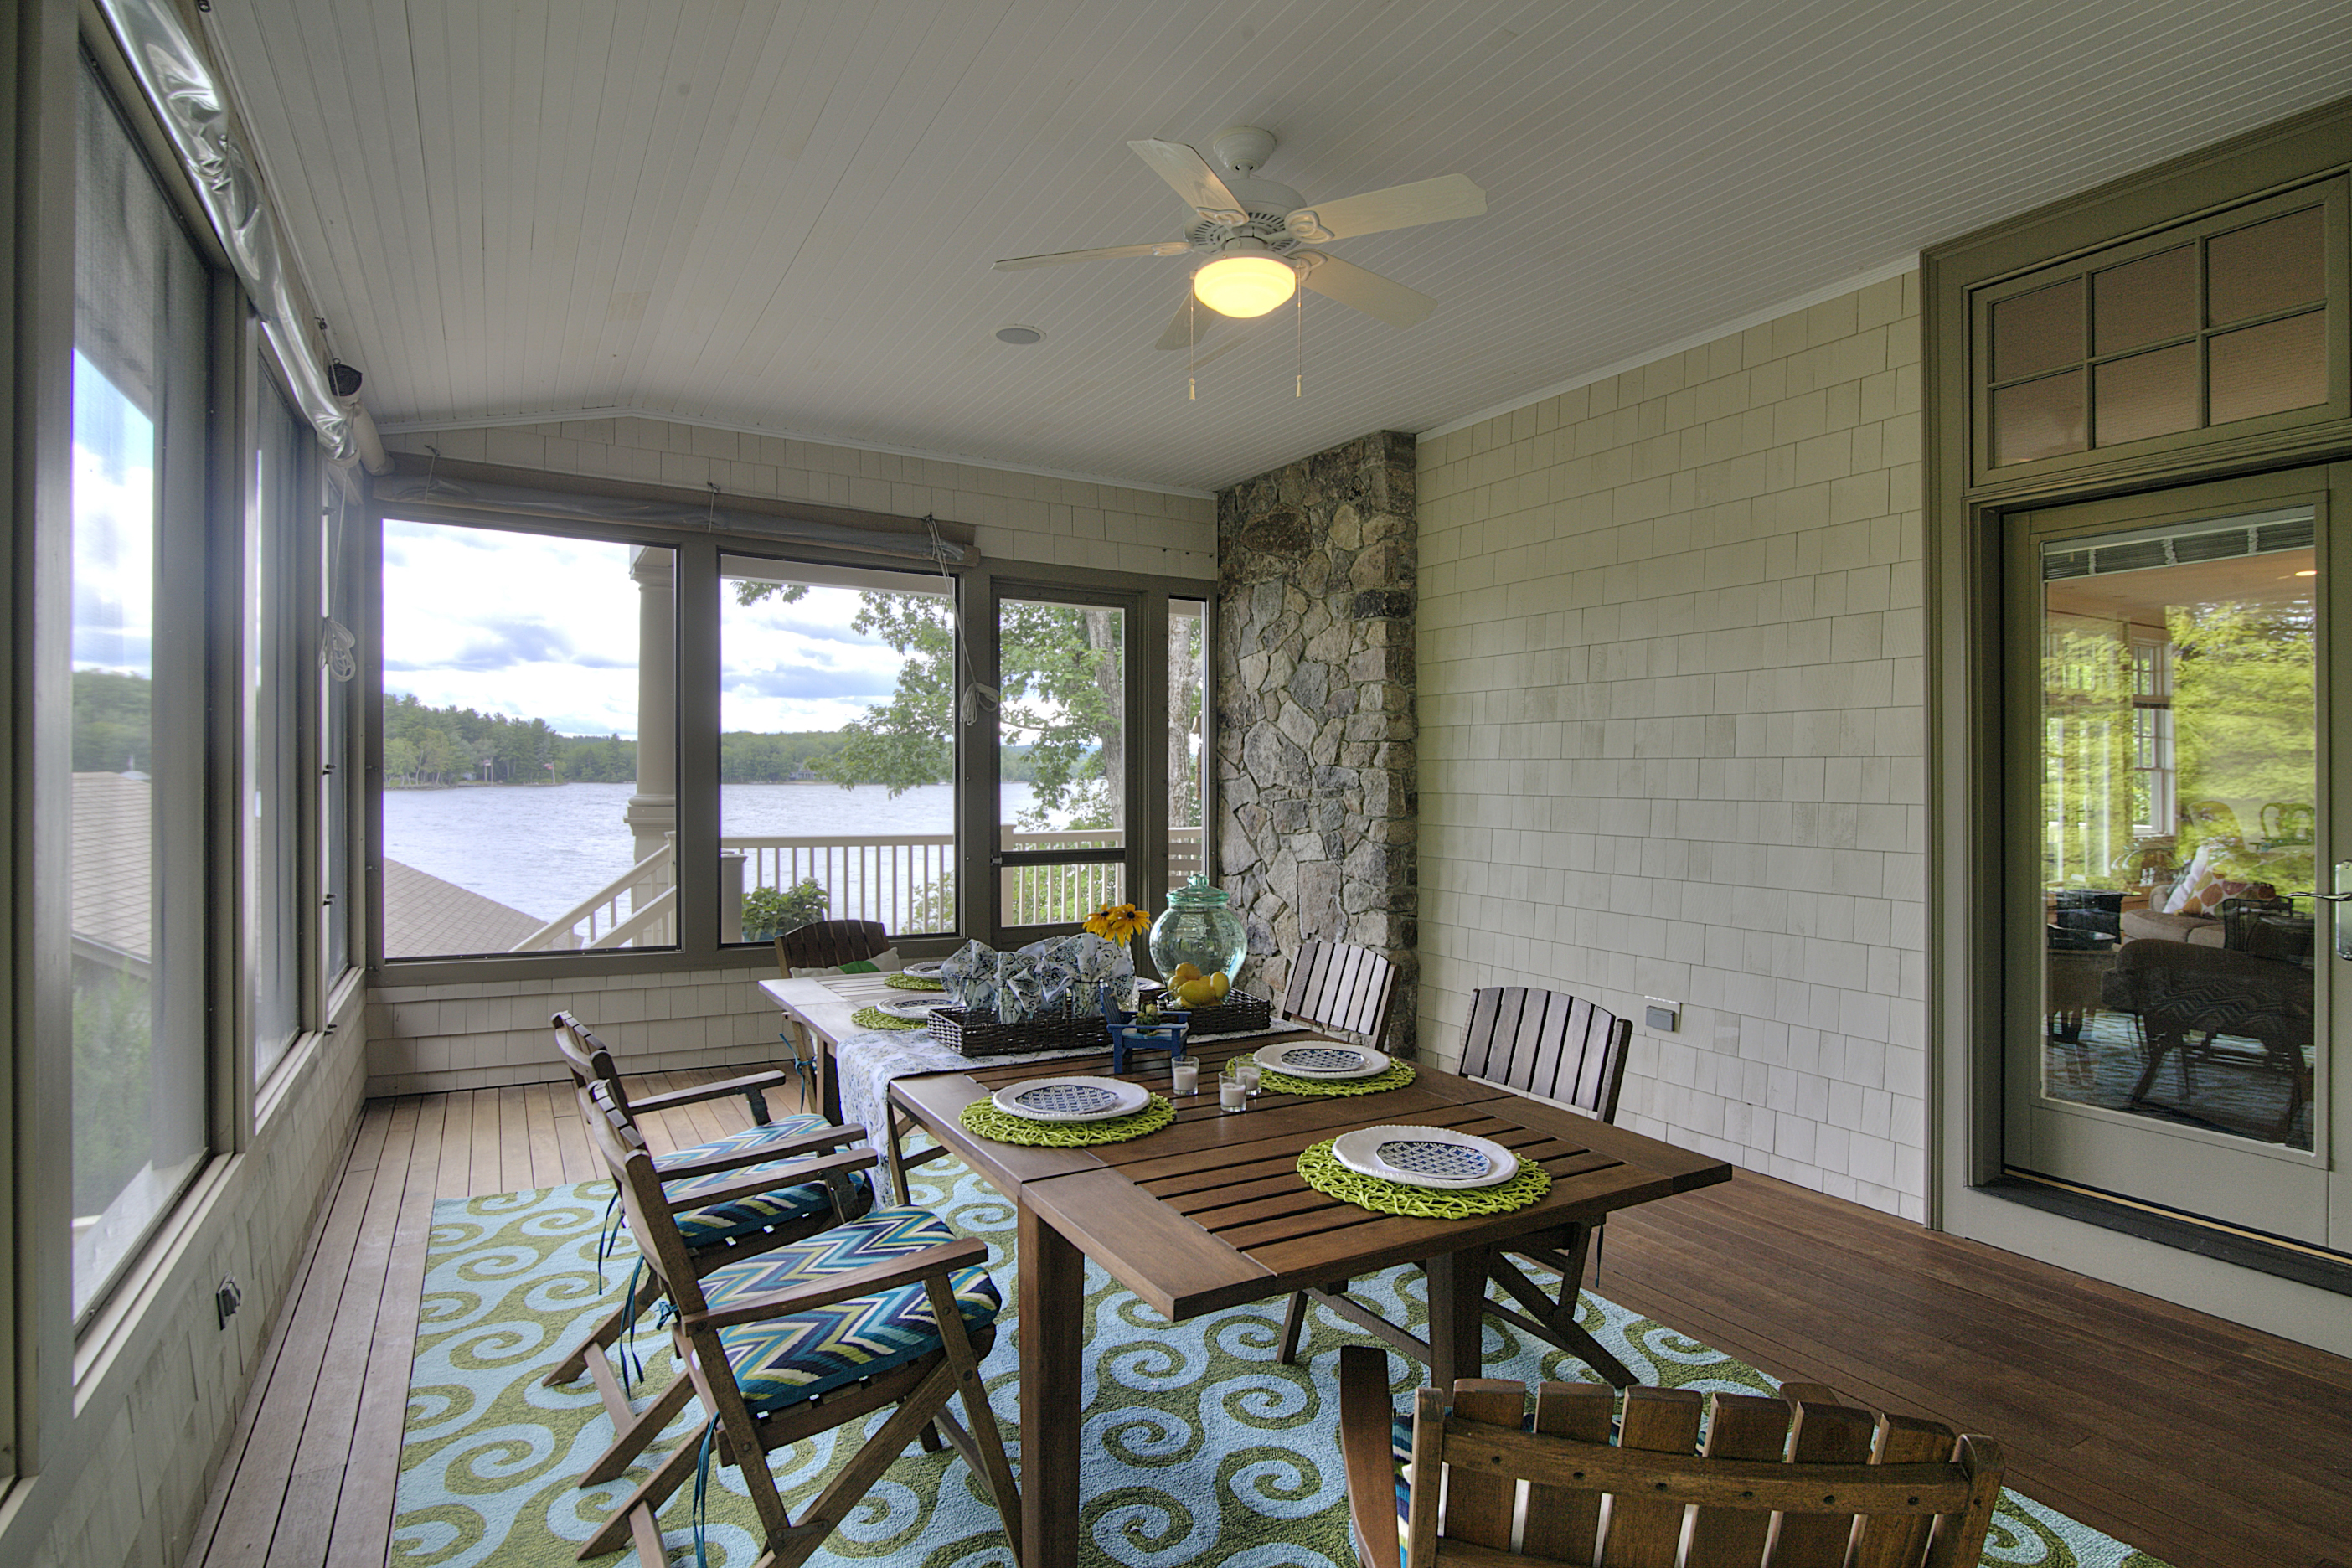 Lake house screen porch decor